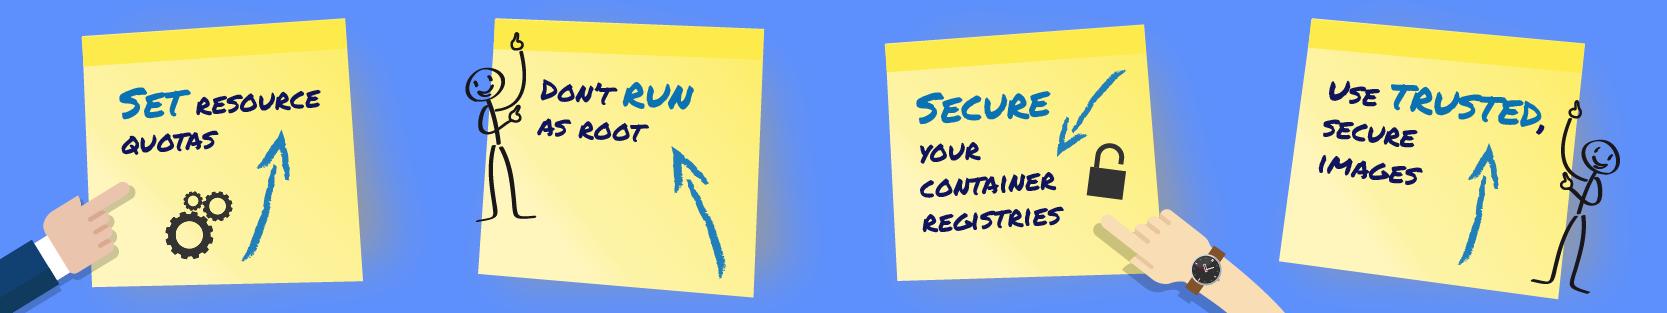 Docker container security Best practices